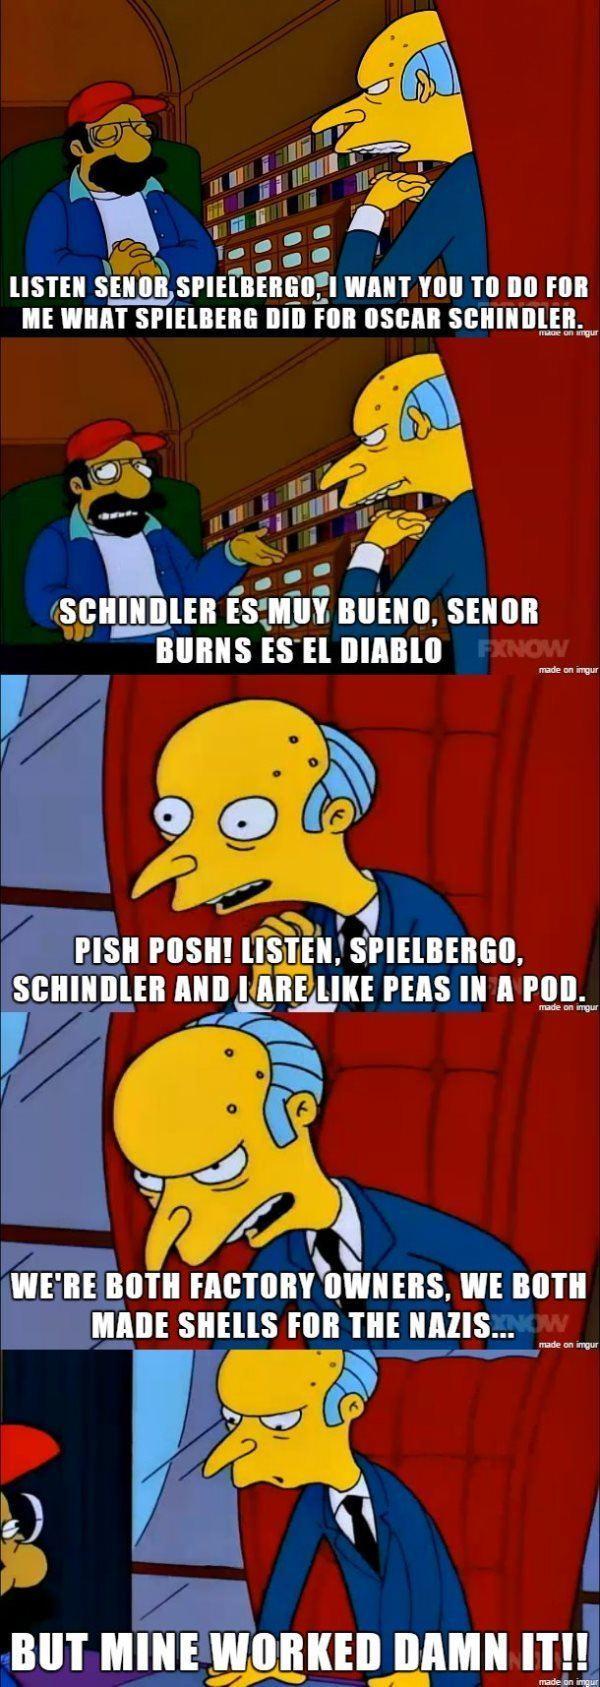 Spielbergo